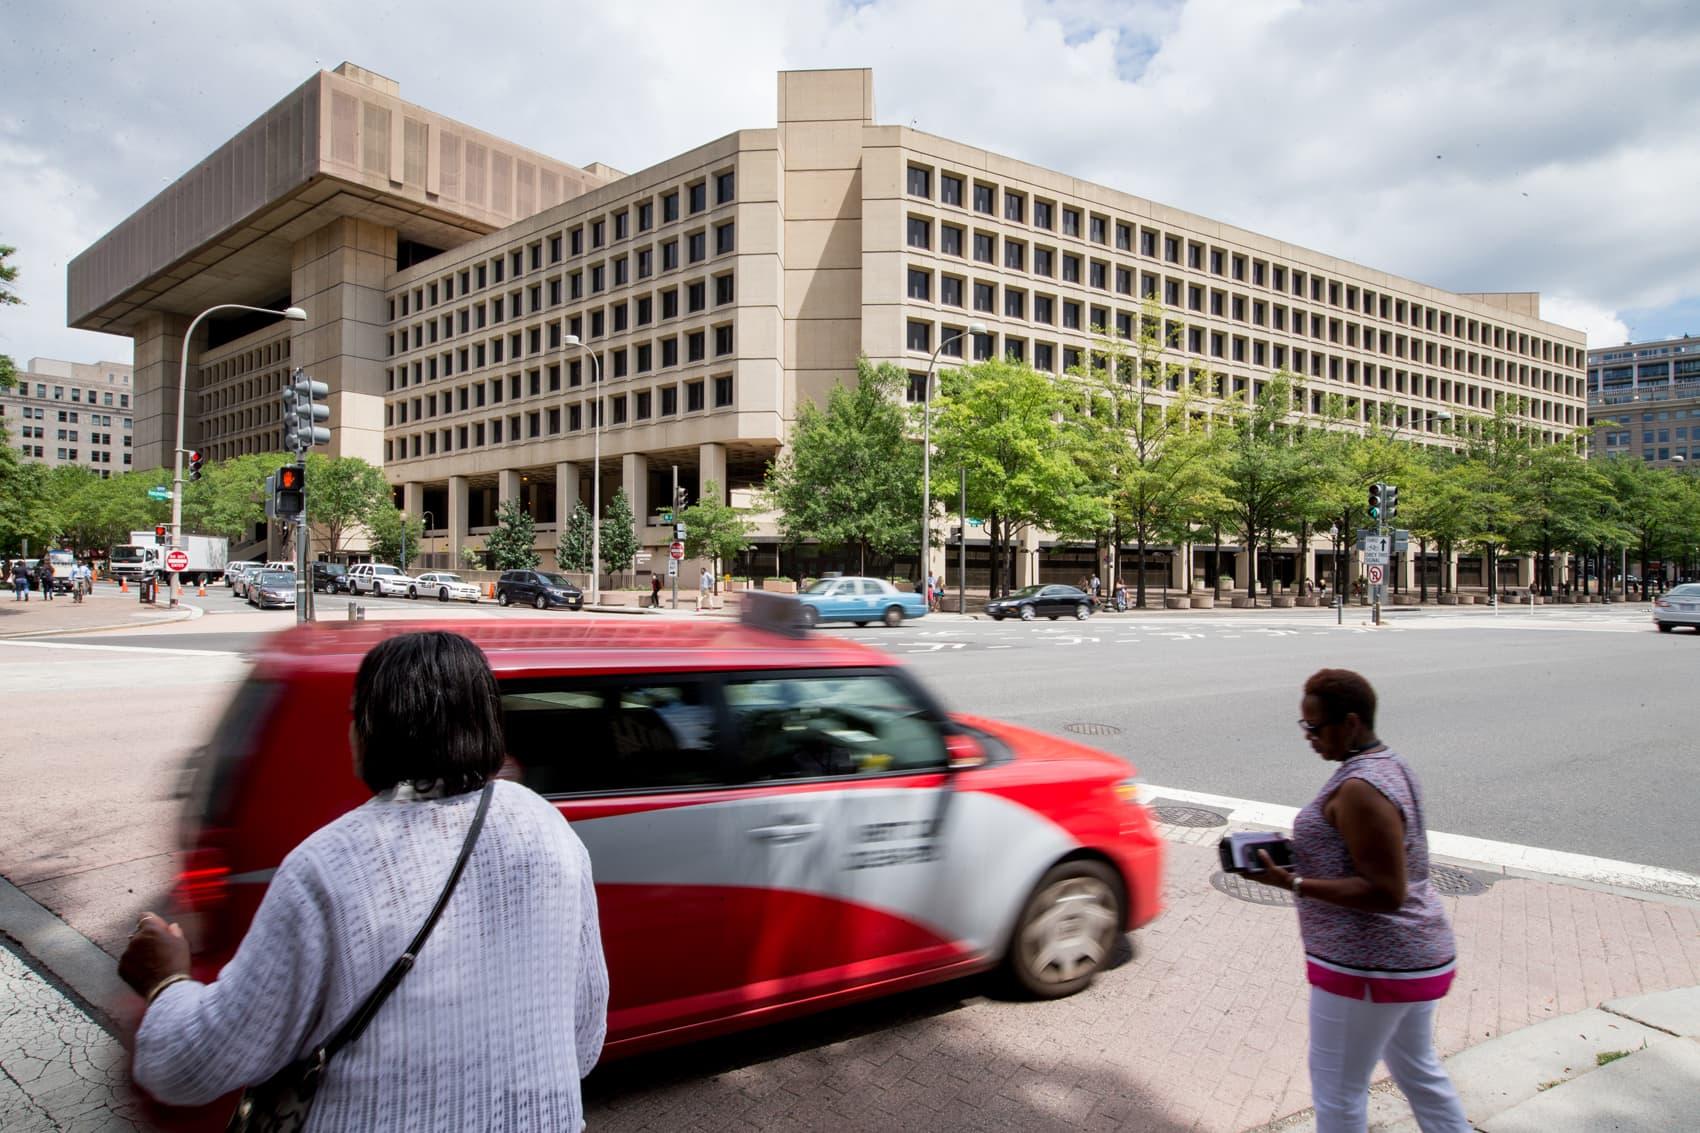 The J. Edgar Hoover Building, the Federal Bureau of Investigation headquarters, in Washington, D.C. (Andrew Harnik/AP)